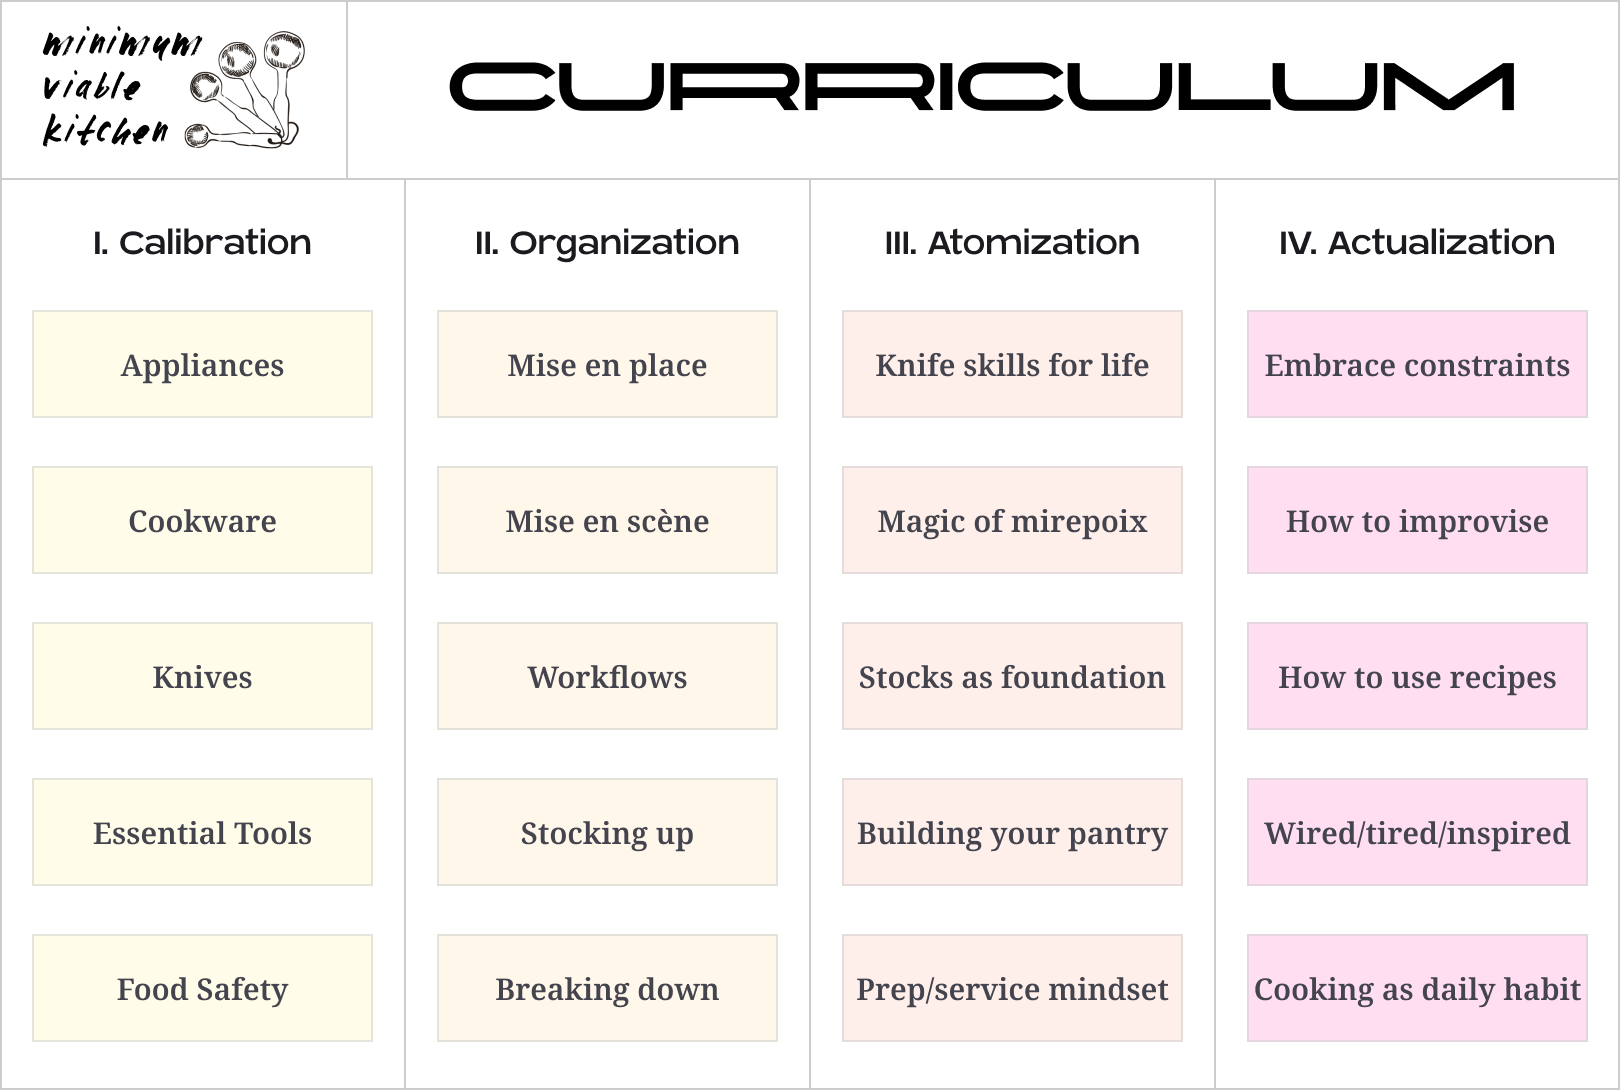 MVK Curriculum Overview